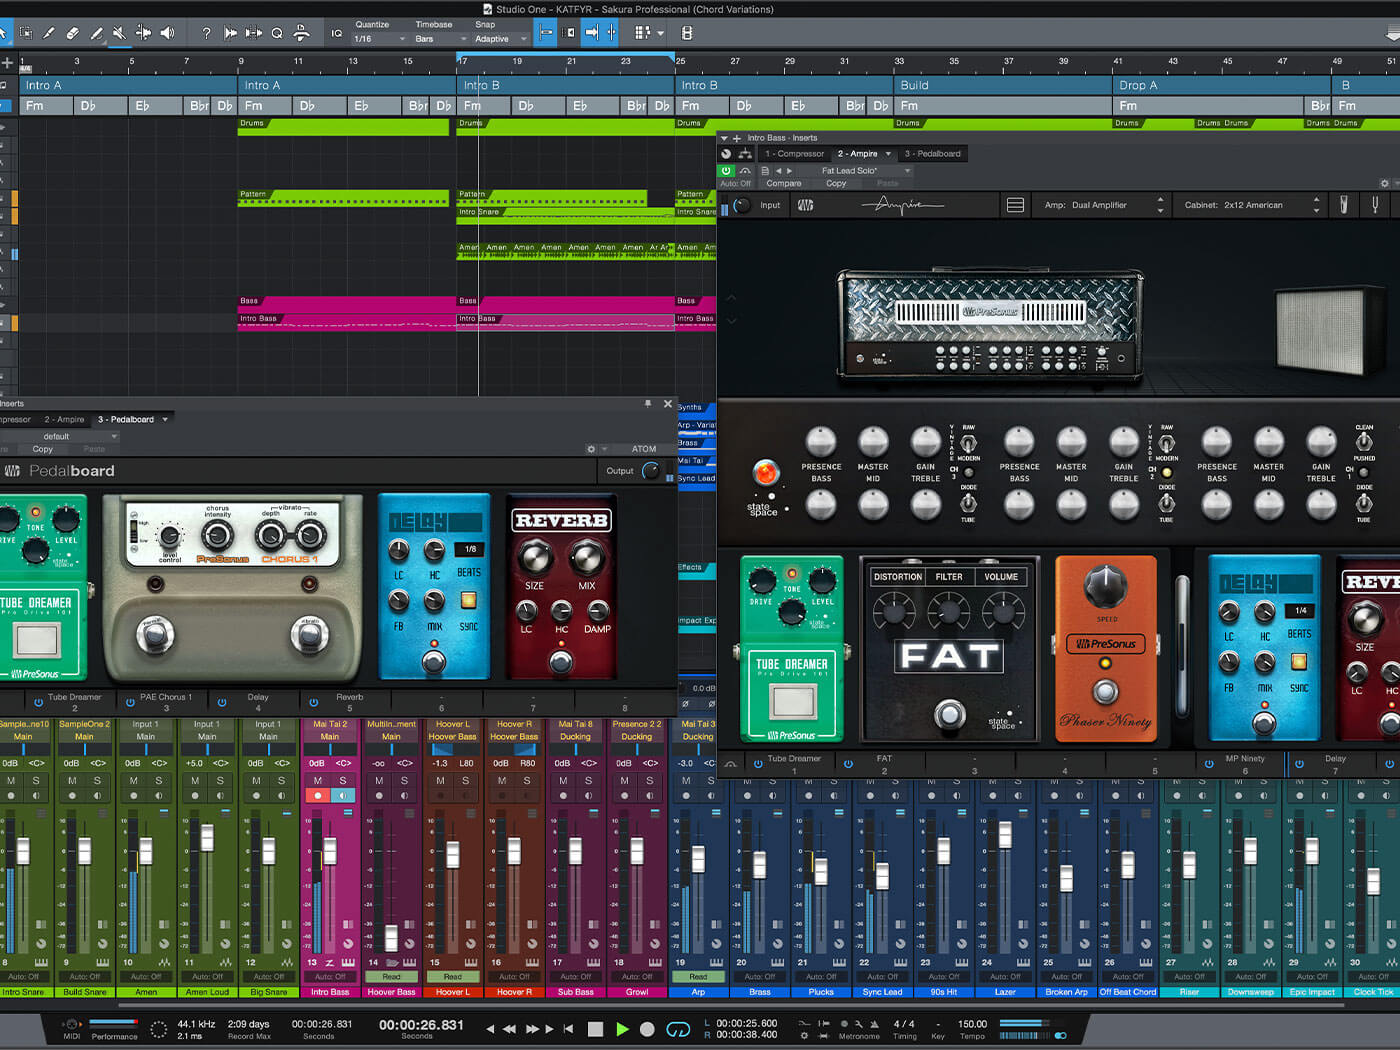 Access all of Studio One's plug-ins in your preferred DAW with PreSonus Hub - MusicTech